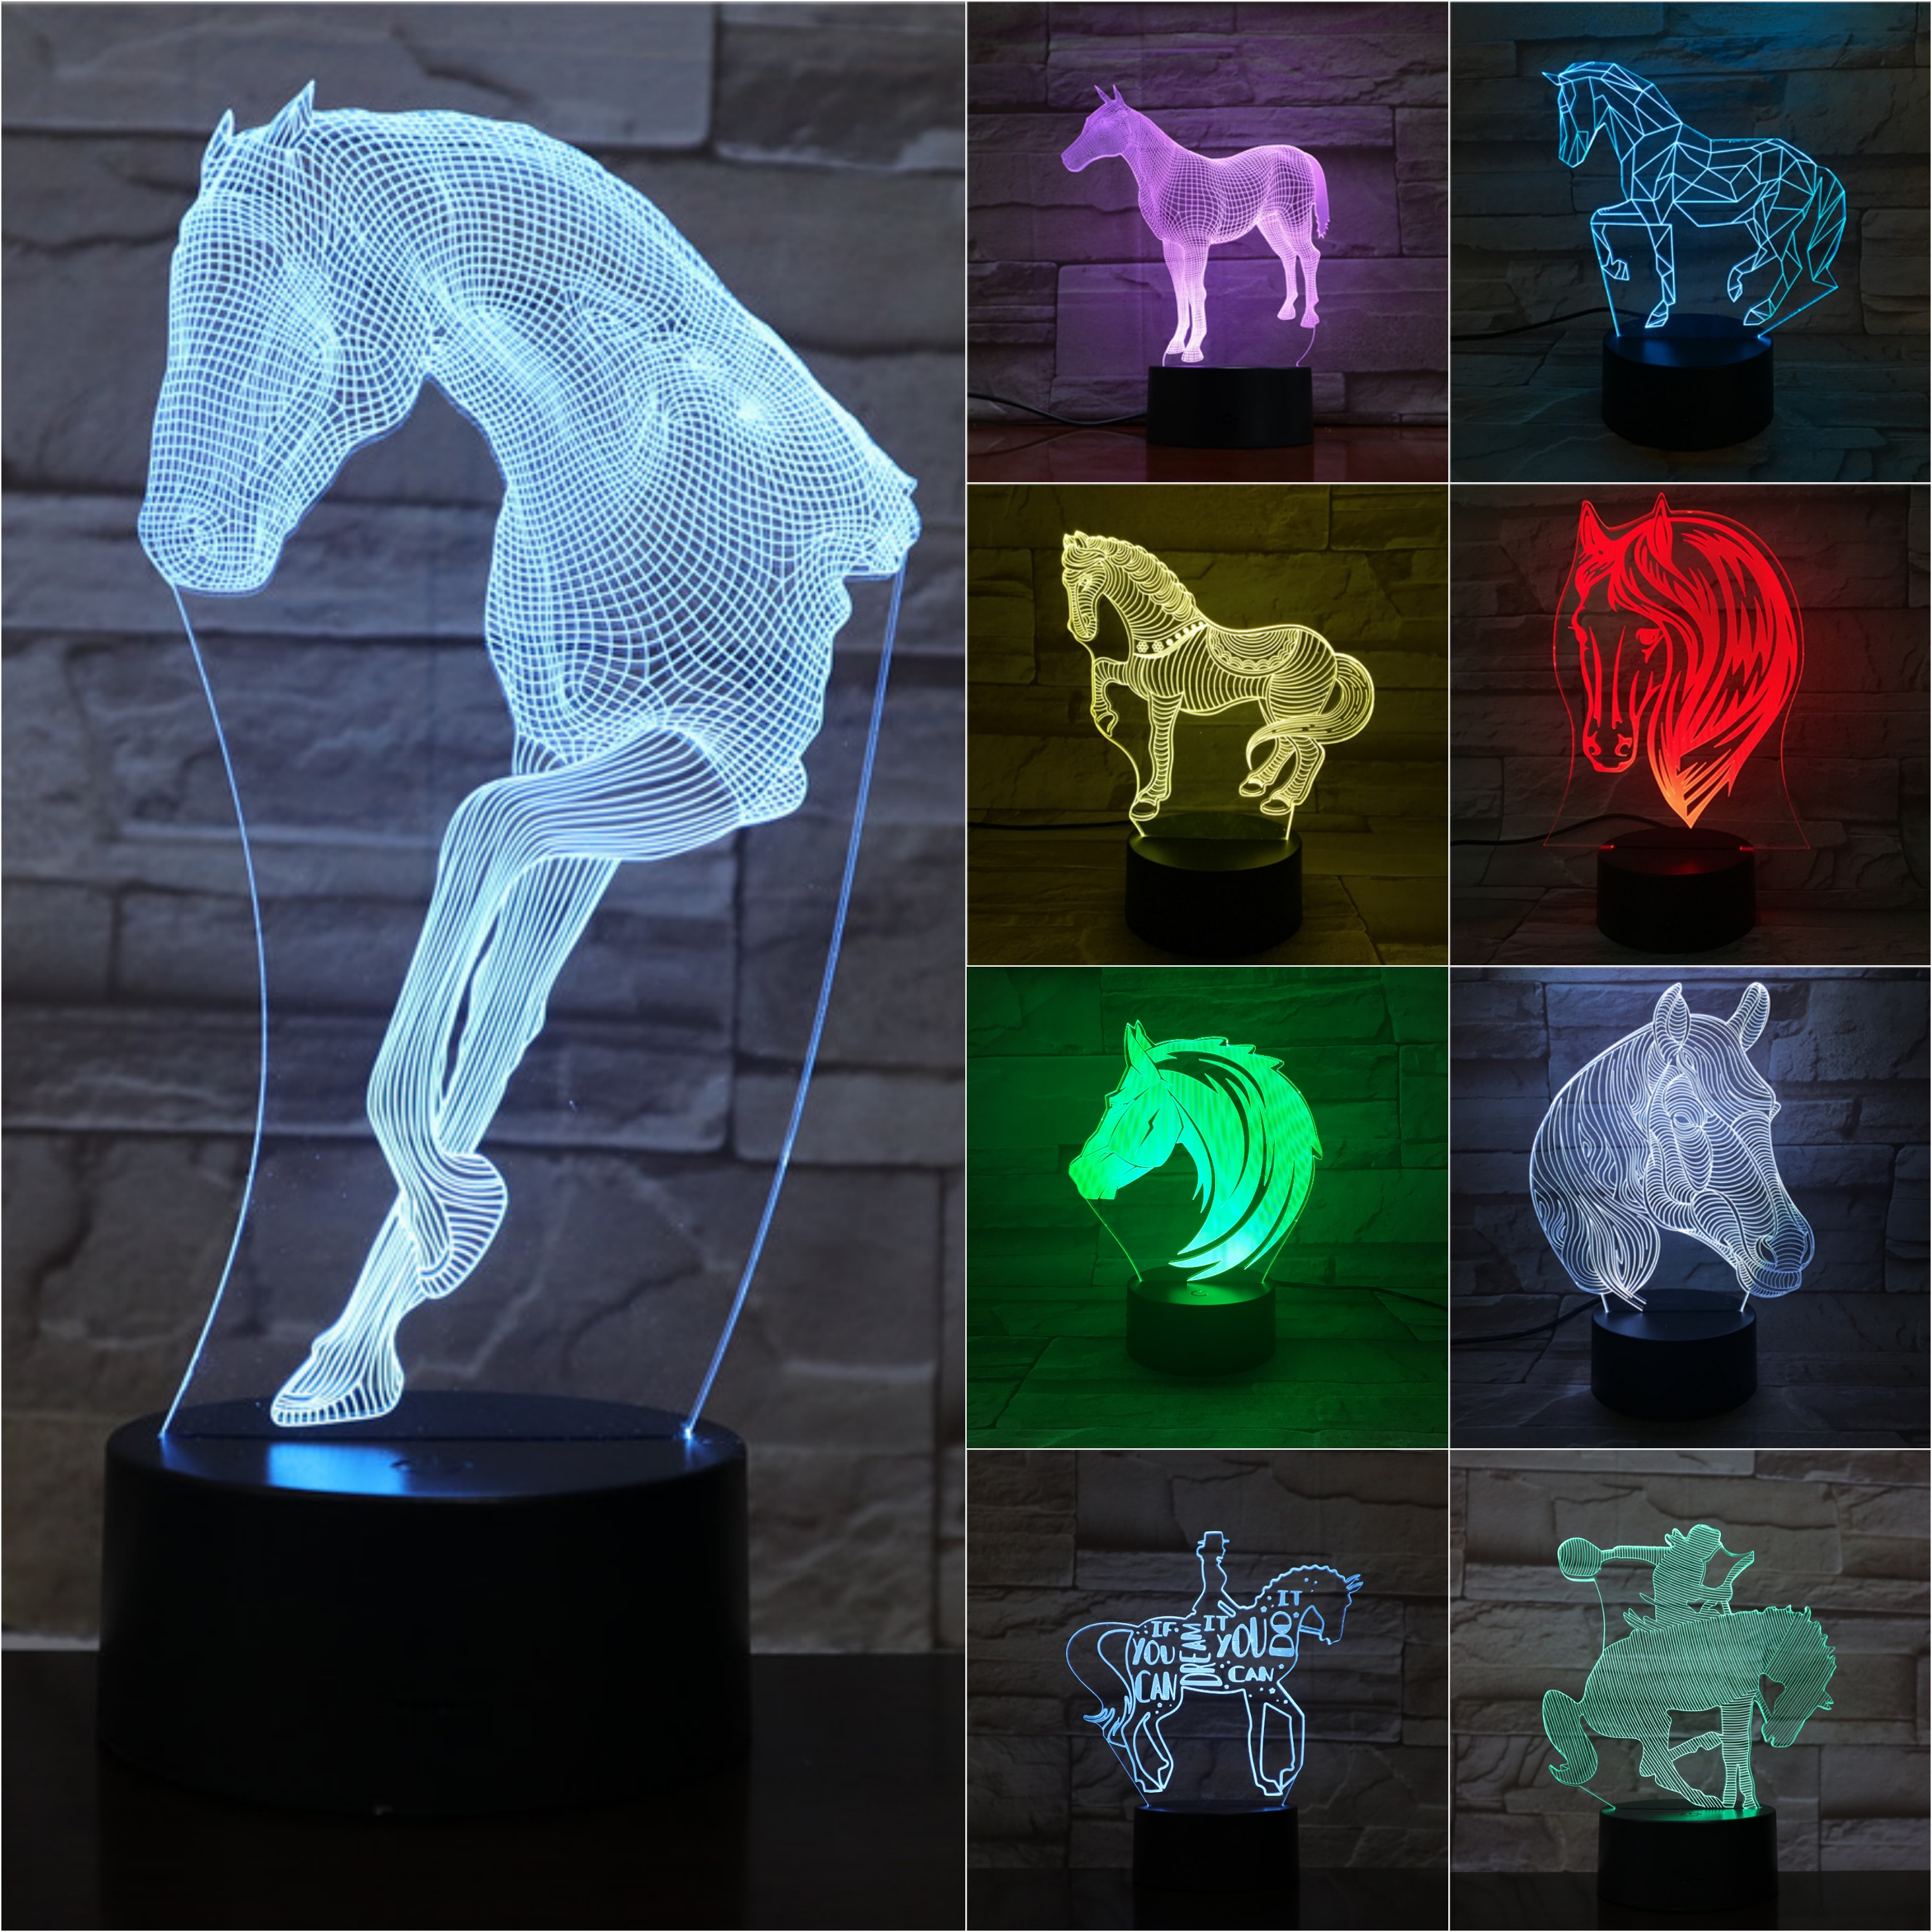 Animal Horse Night Light LED 3D Illusion 7 Color Changing Room Decorative Lamp Child Kid Baby Kit Desk Bedside Gift